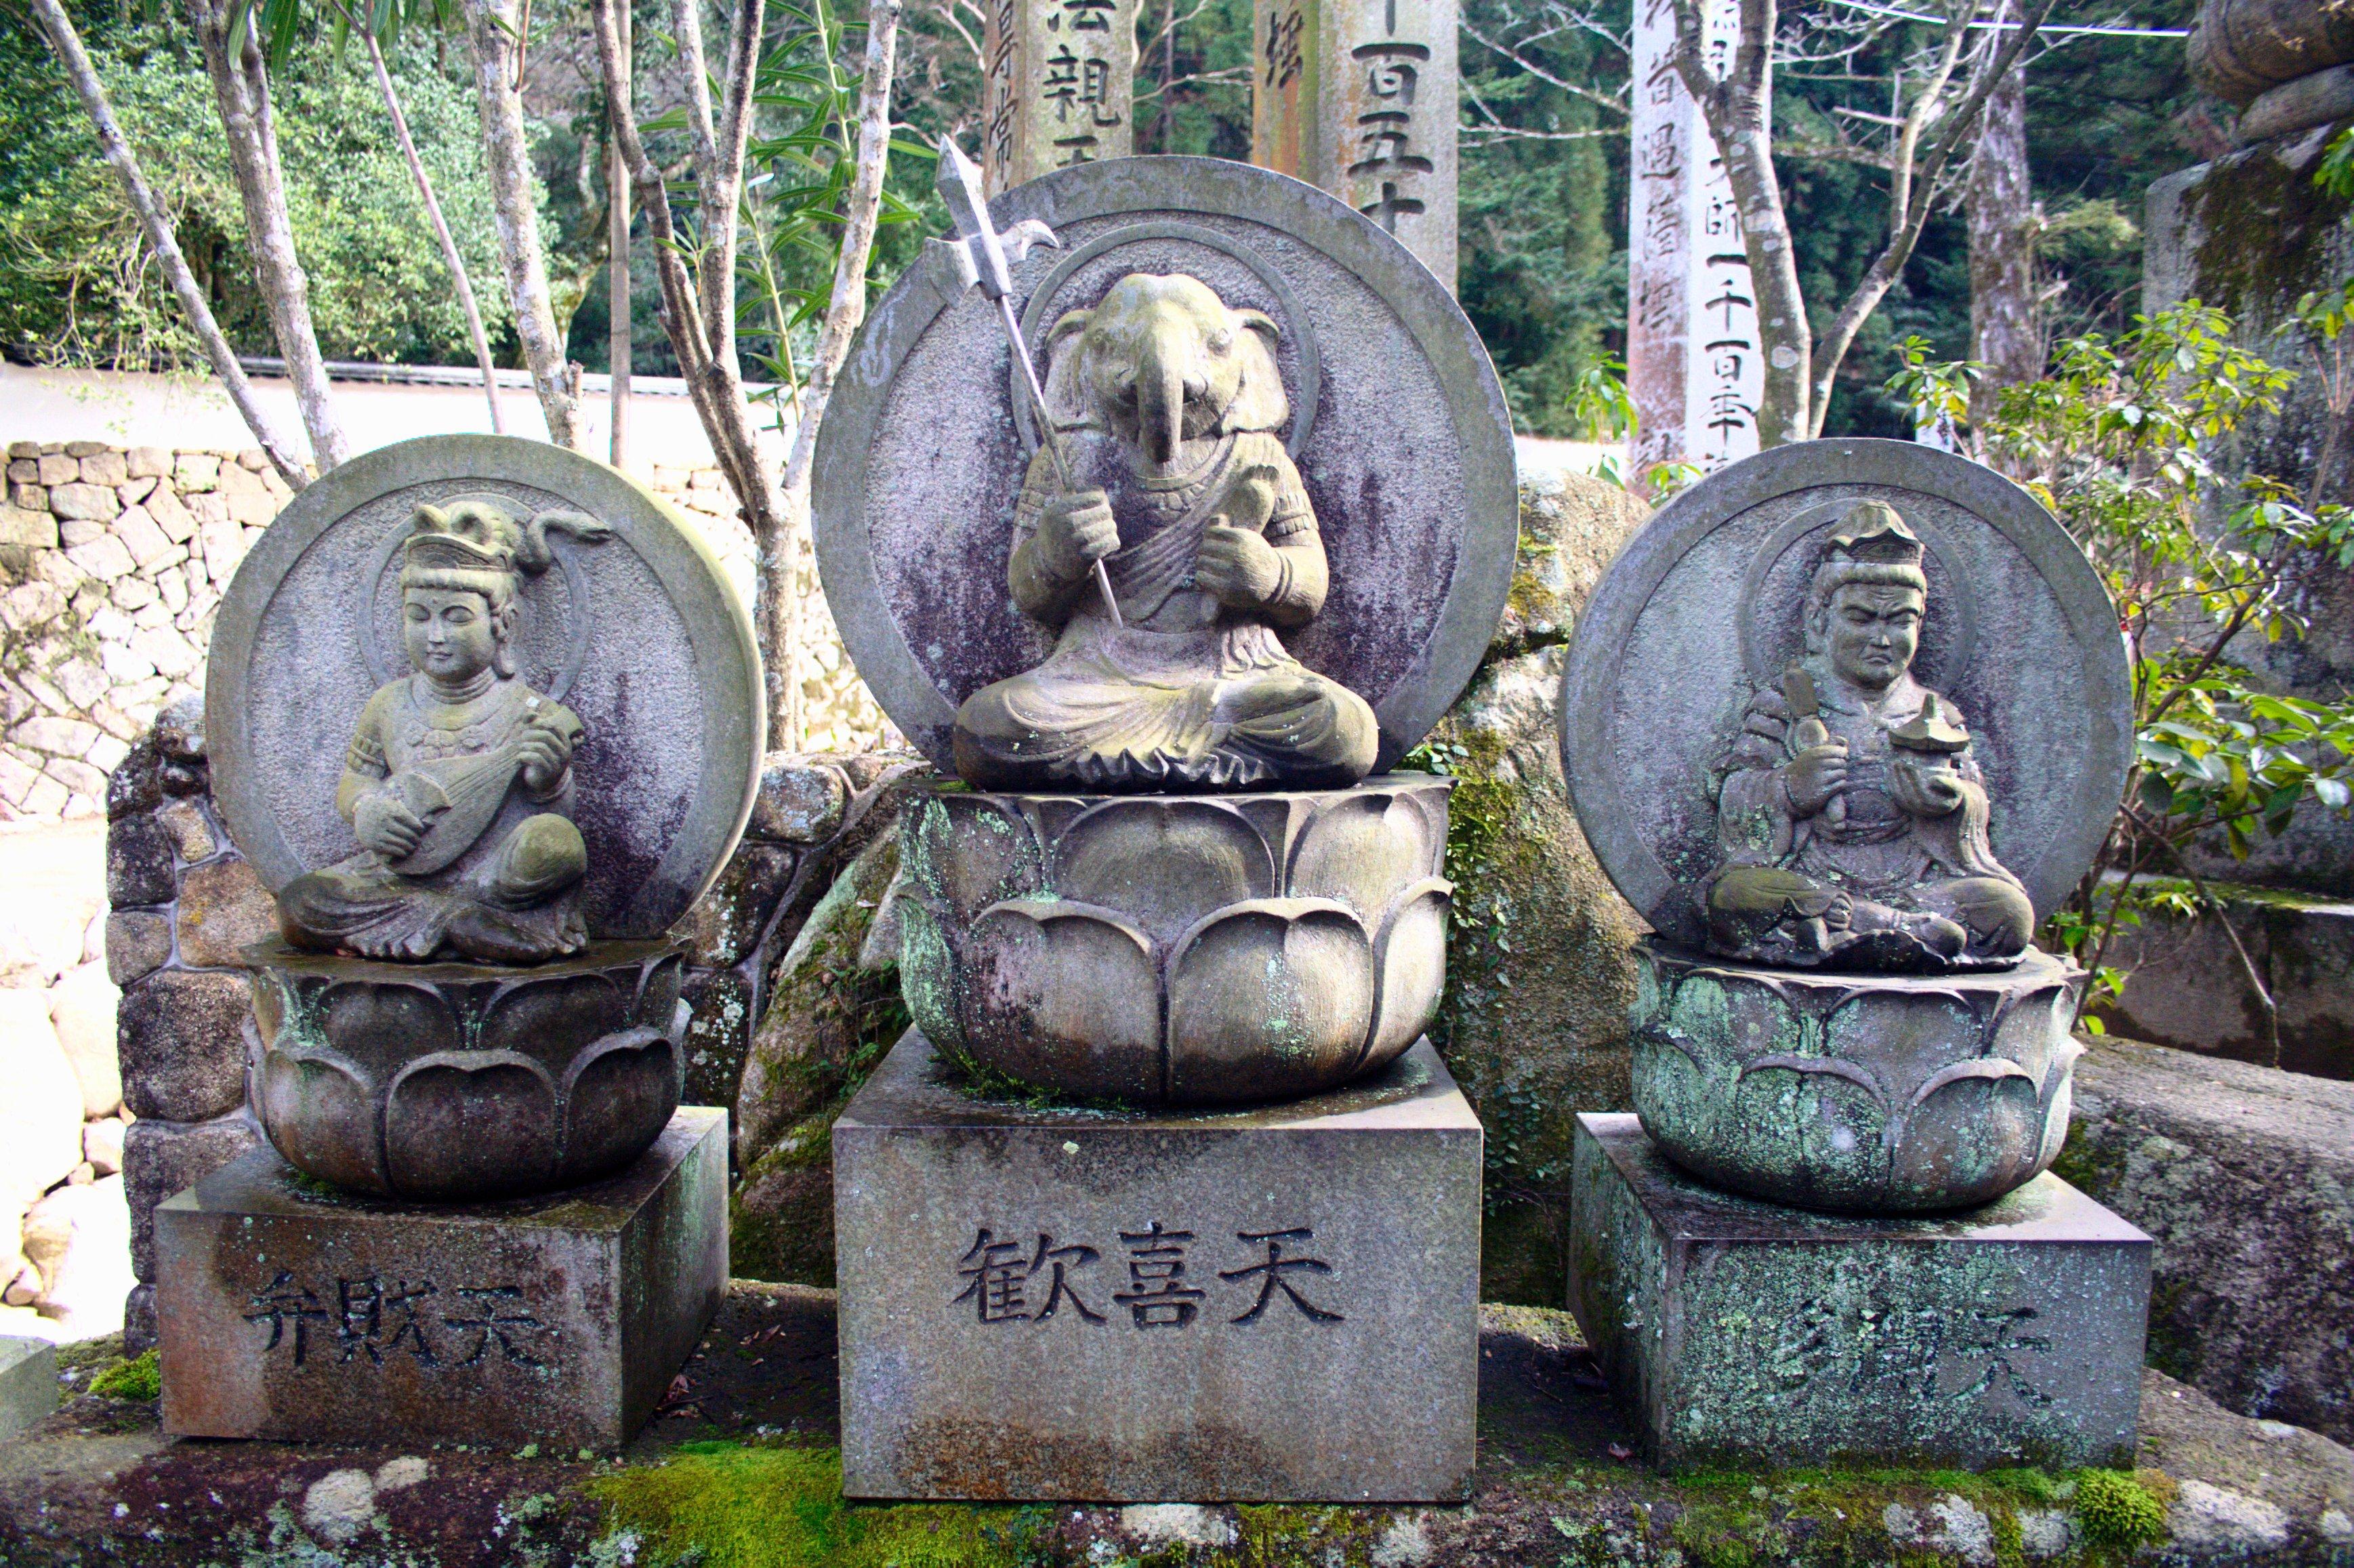 https://en.wikipedia.org/wiki/File:Ganesha_Japan.jpg